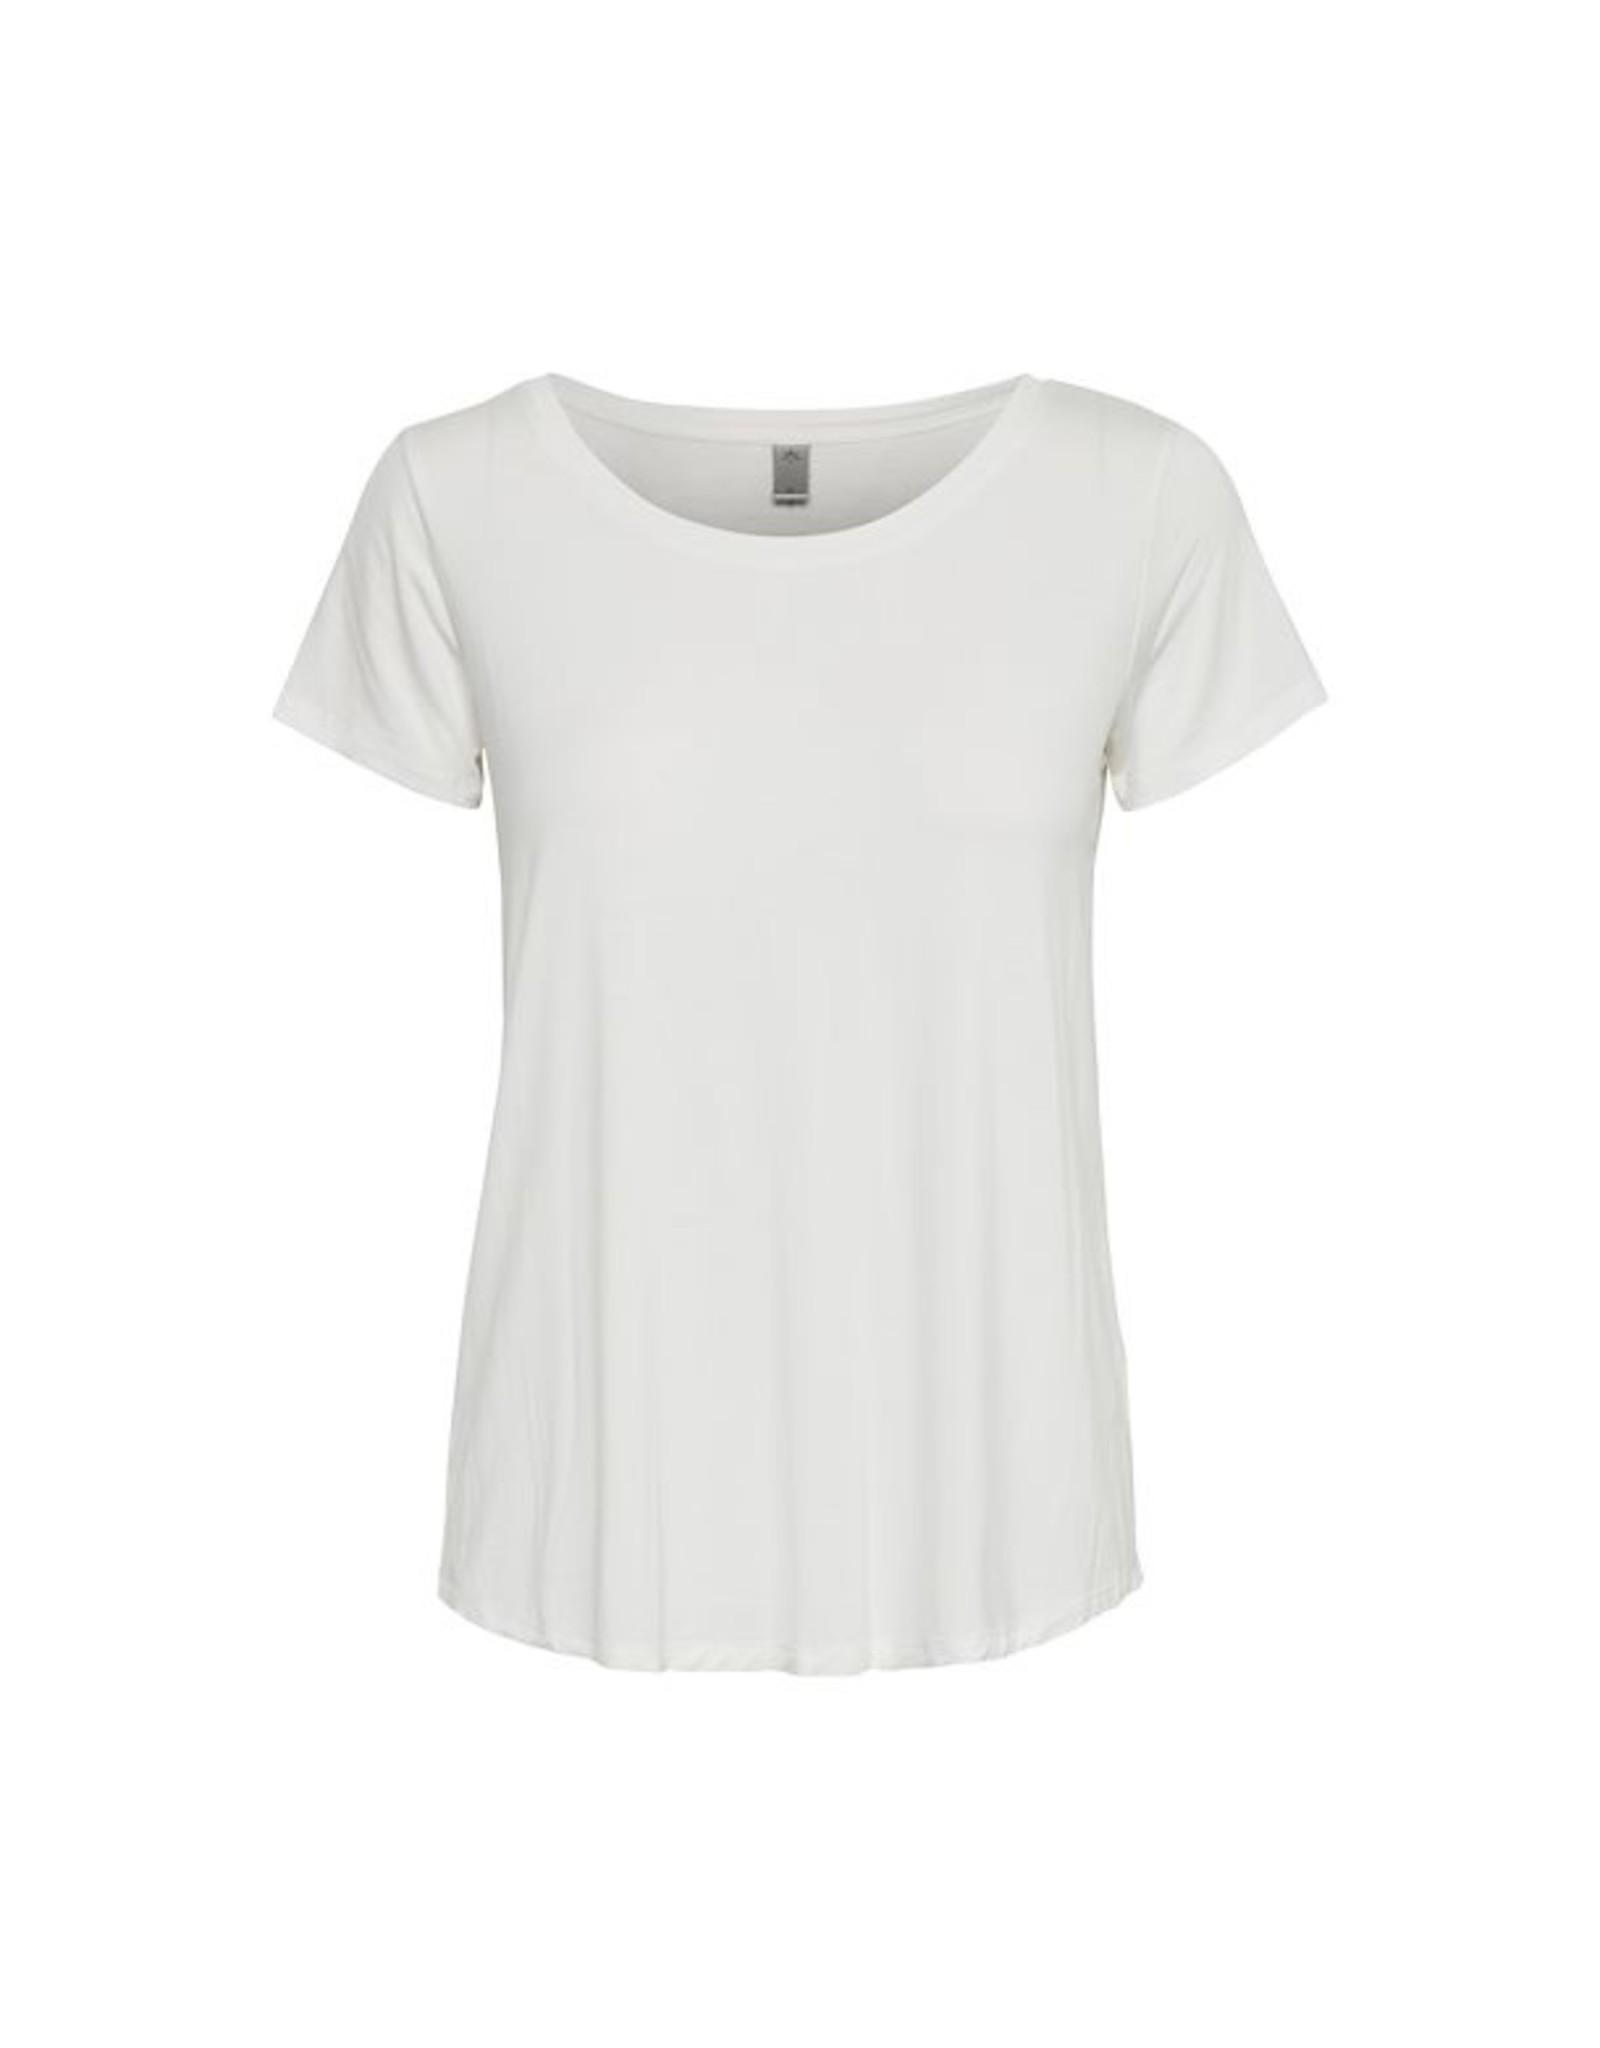 Culture Poppy T-Shirt